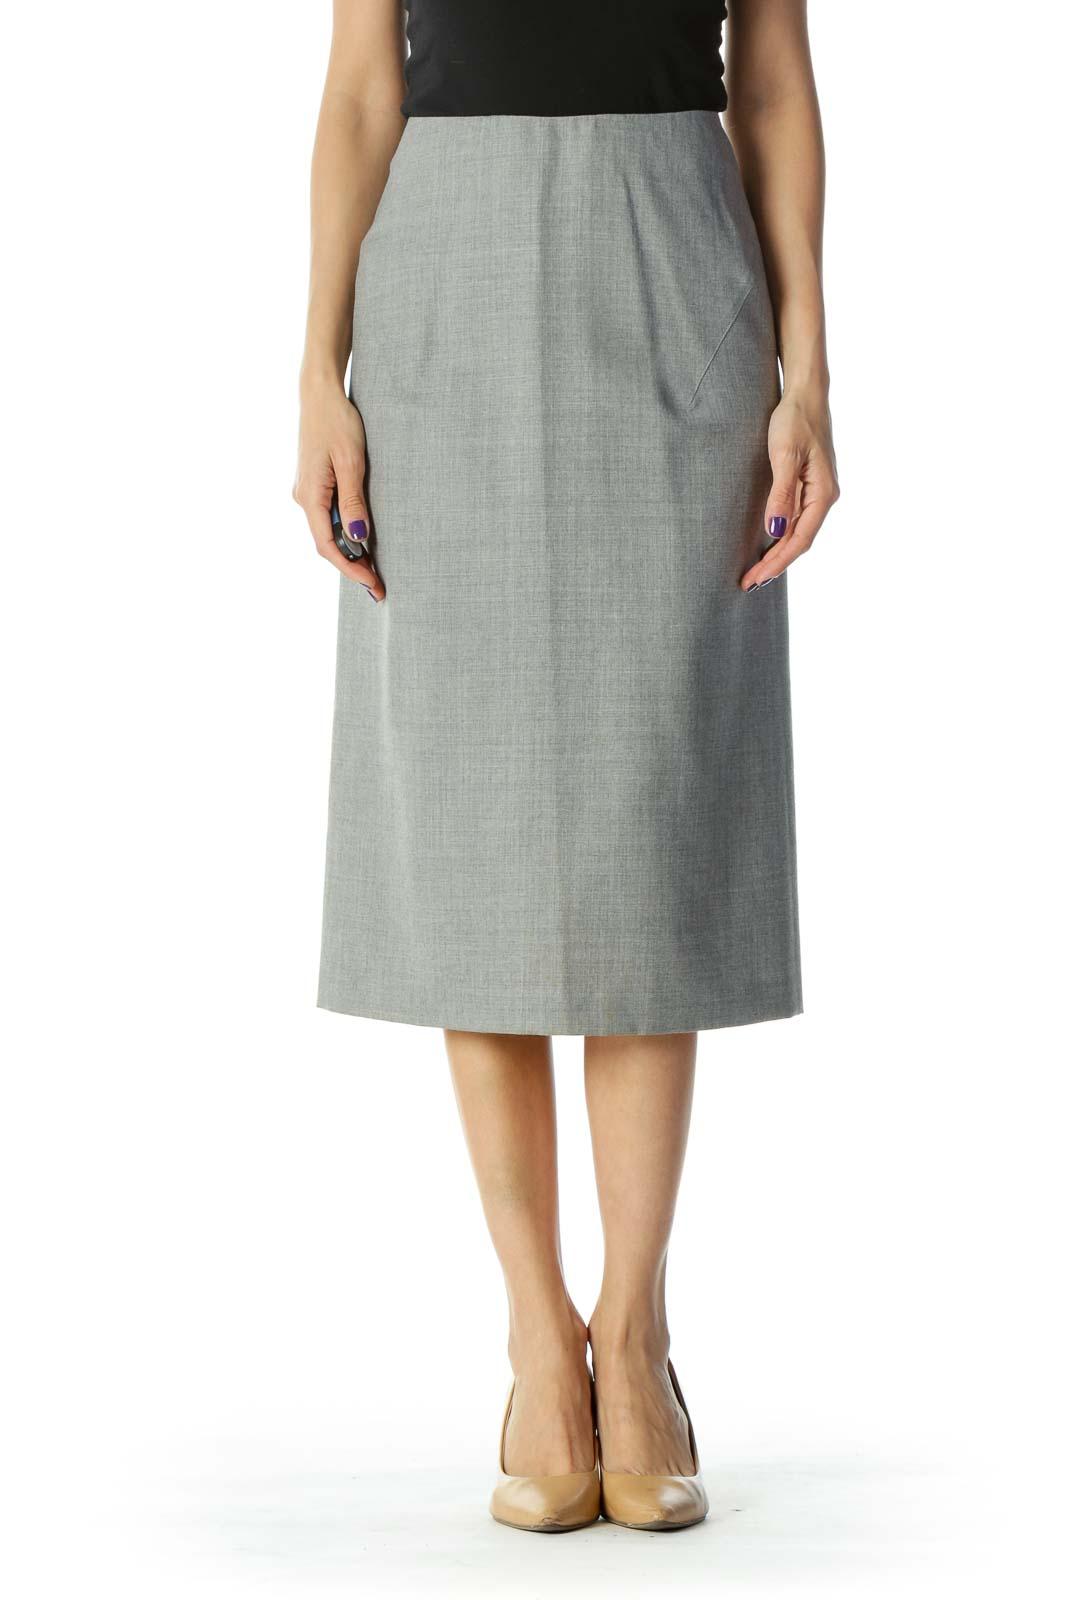 Gray Midi Pencil Skirt Front